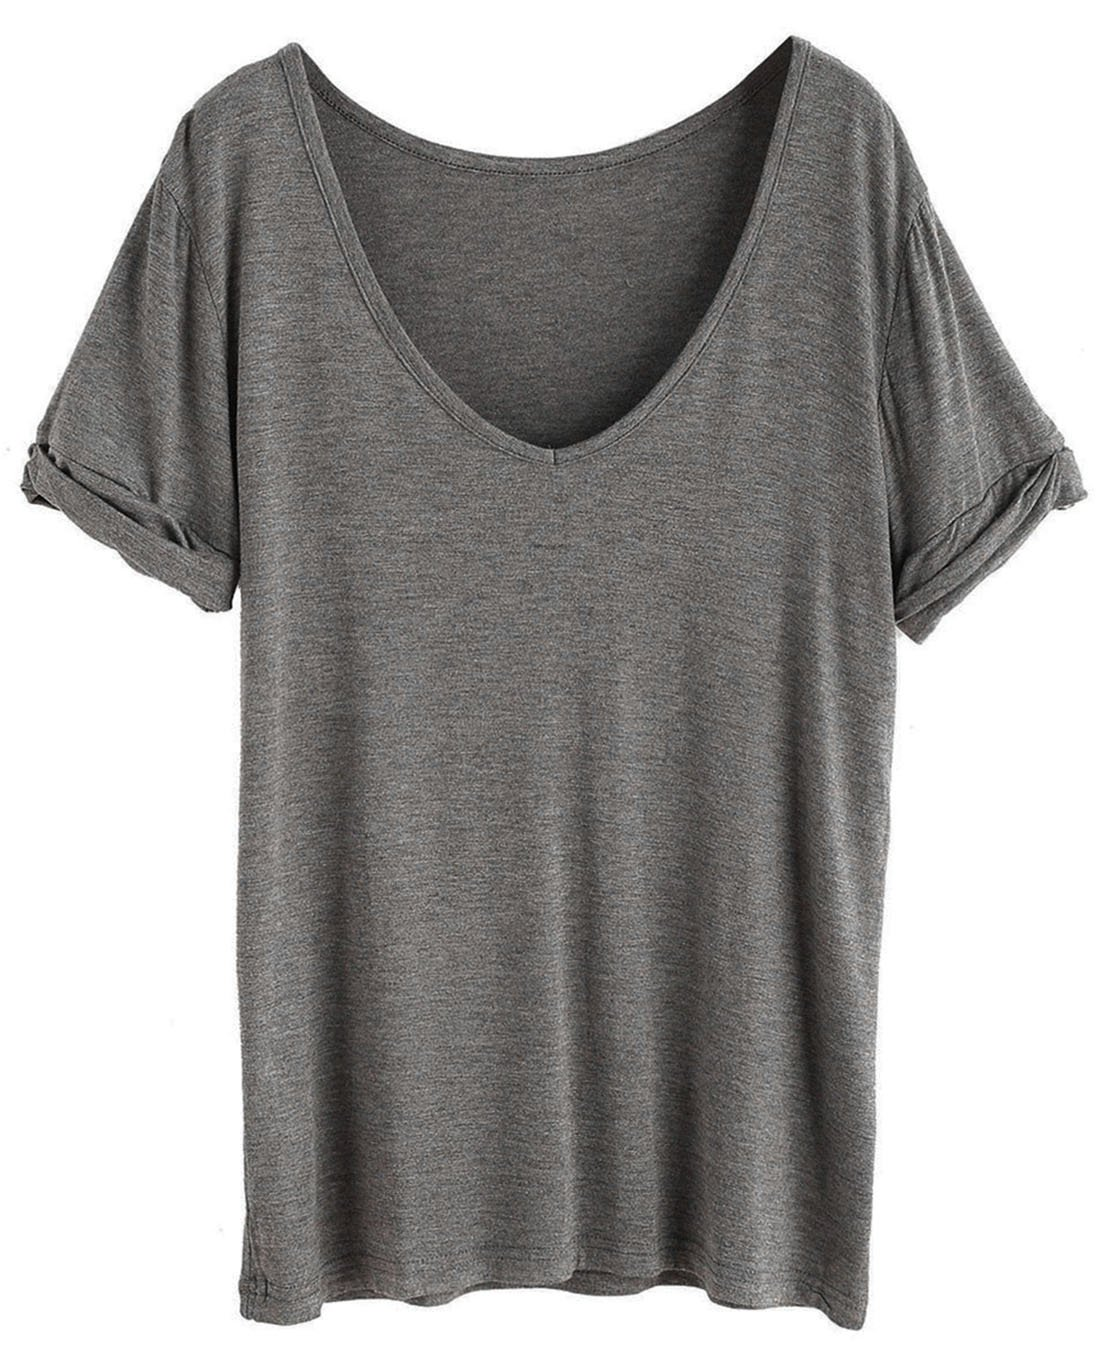 SheIn Women's Summer Short Sleeve Loose Casual Tee T-Shirt Dark Grey# XX-Large